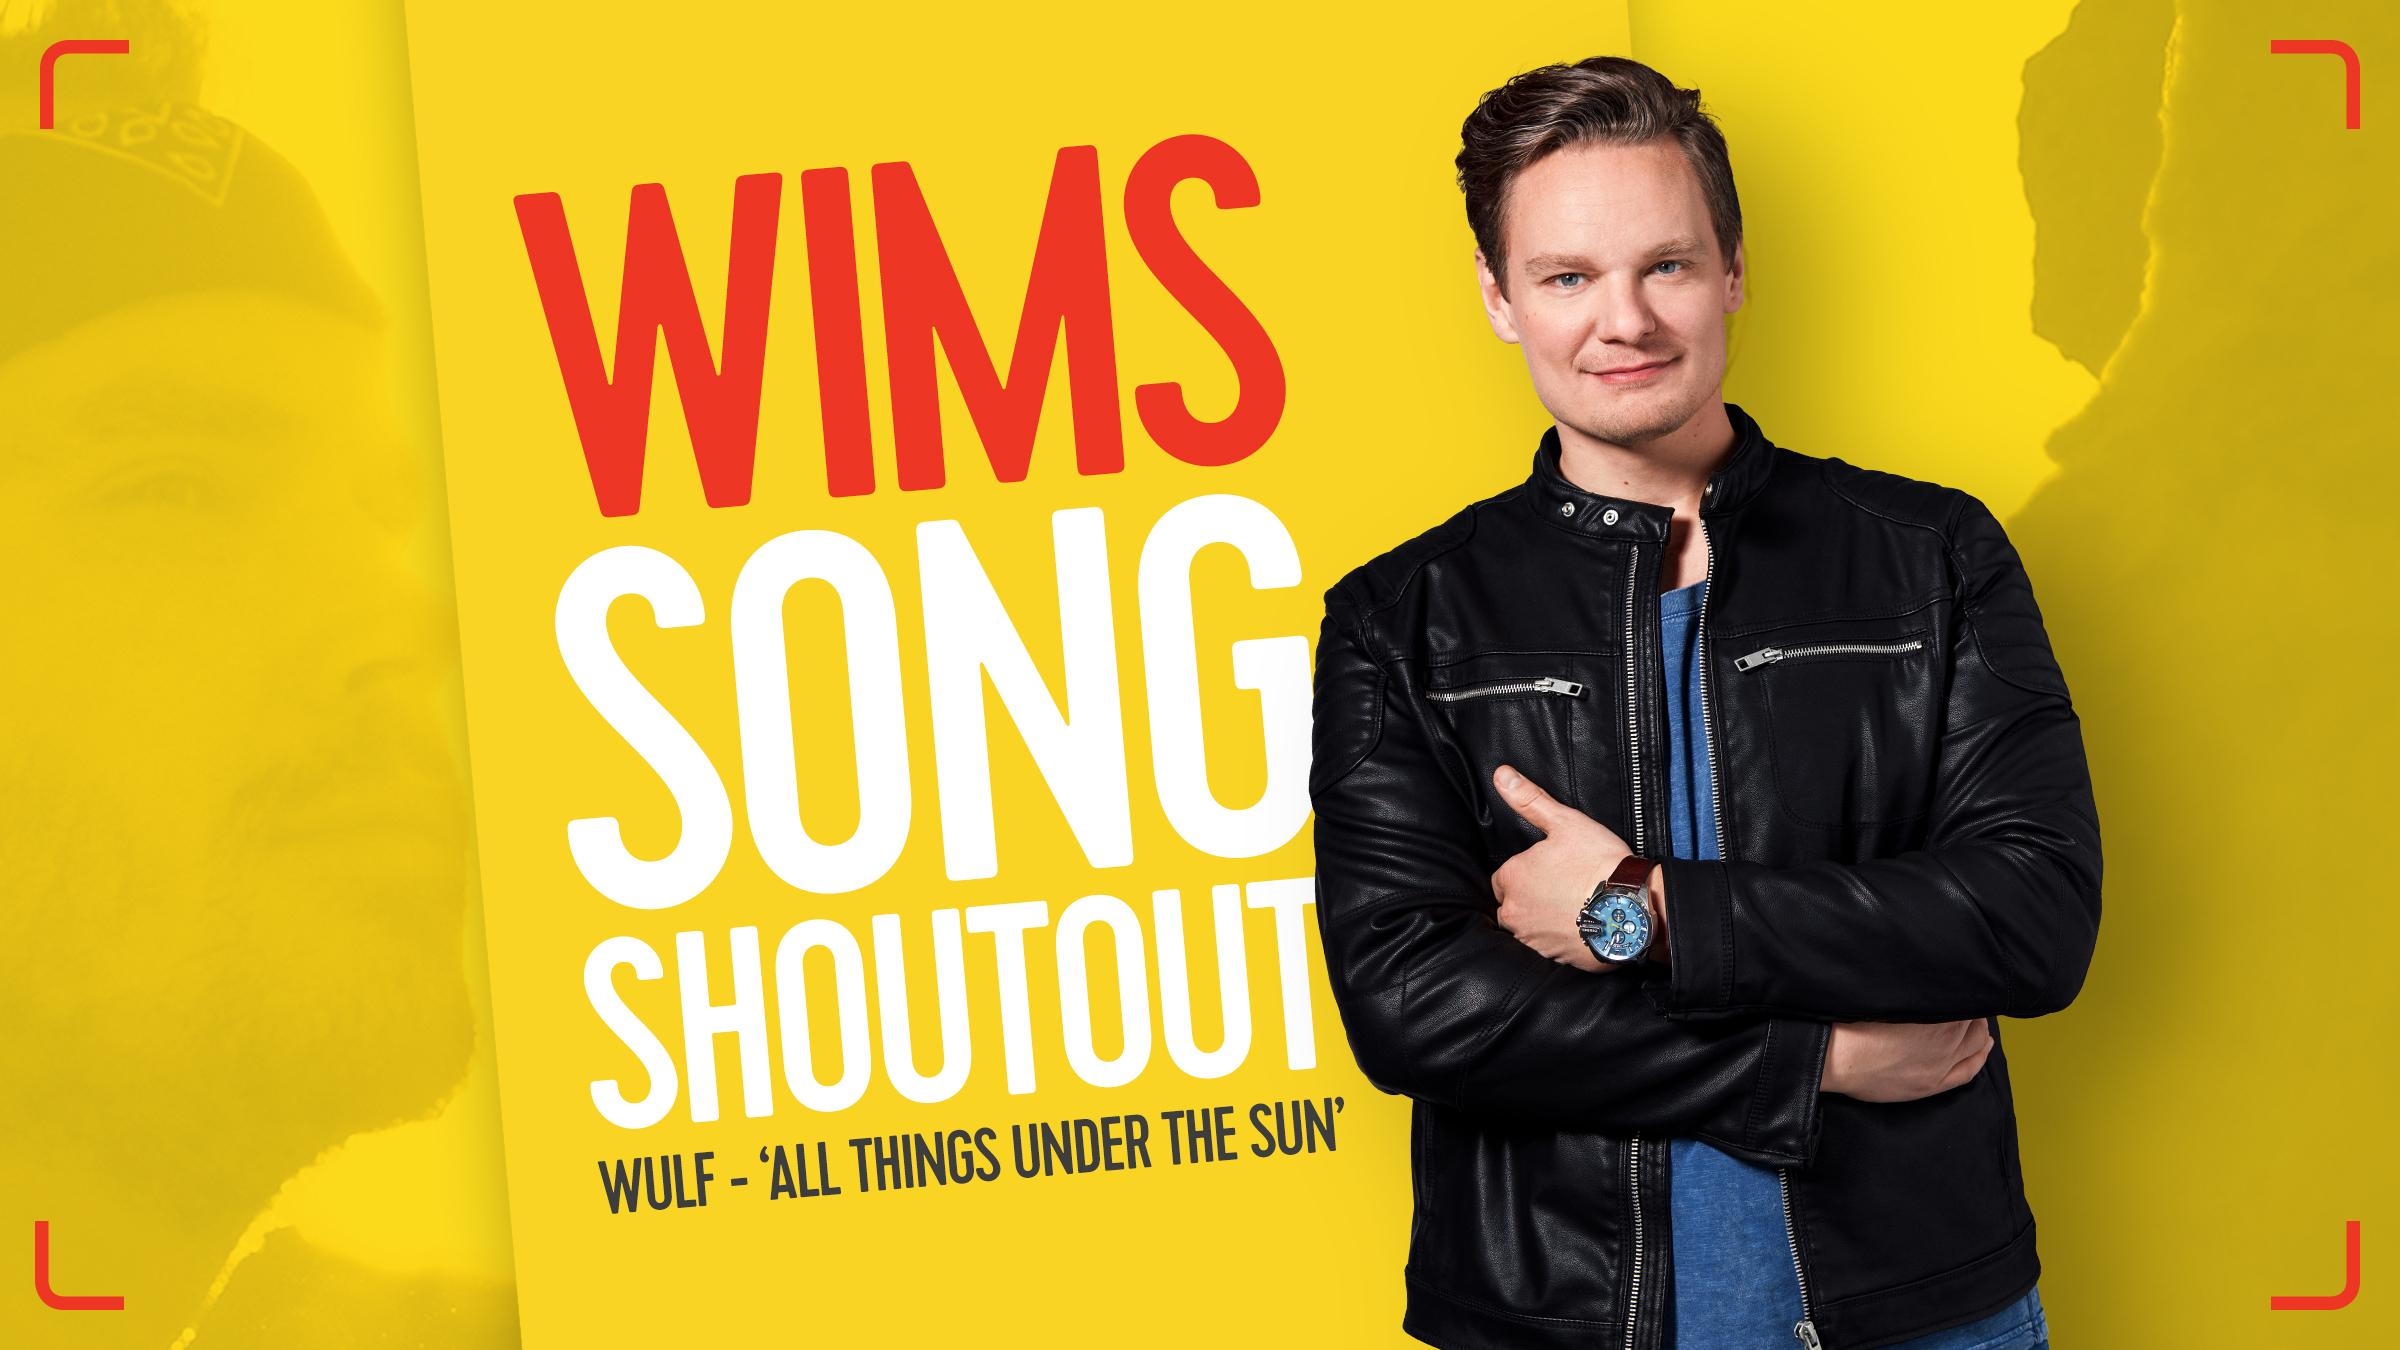 Wulf teaser songshoutout